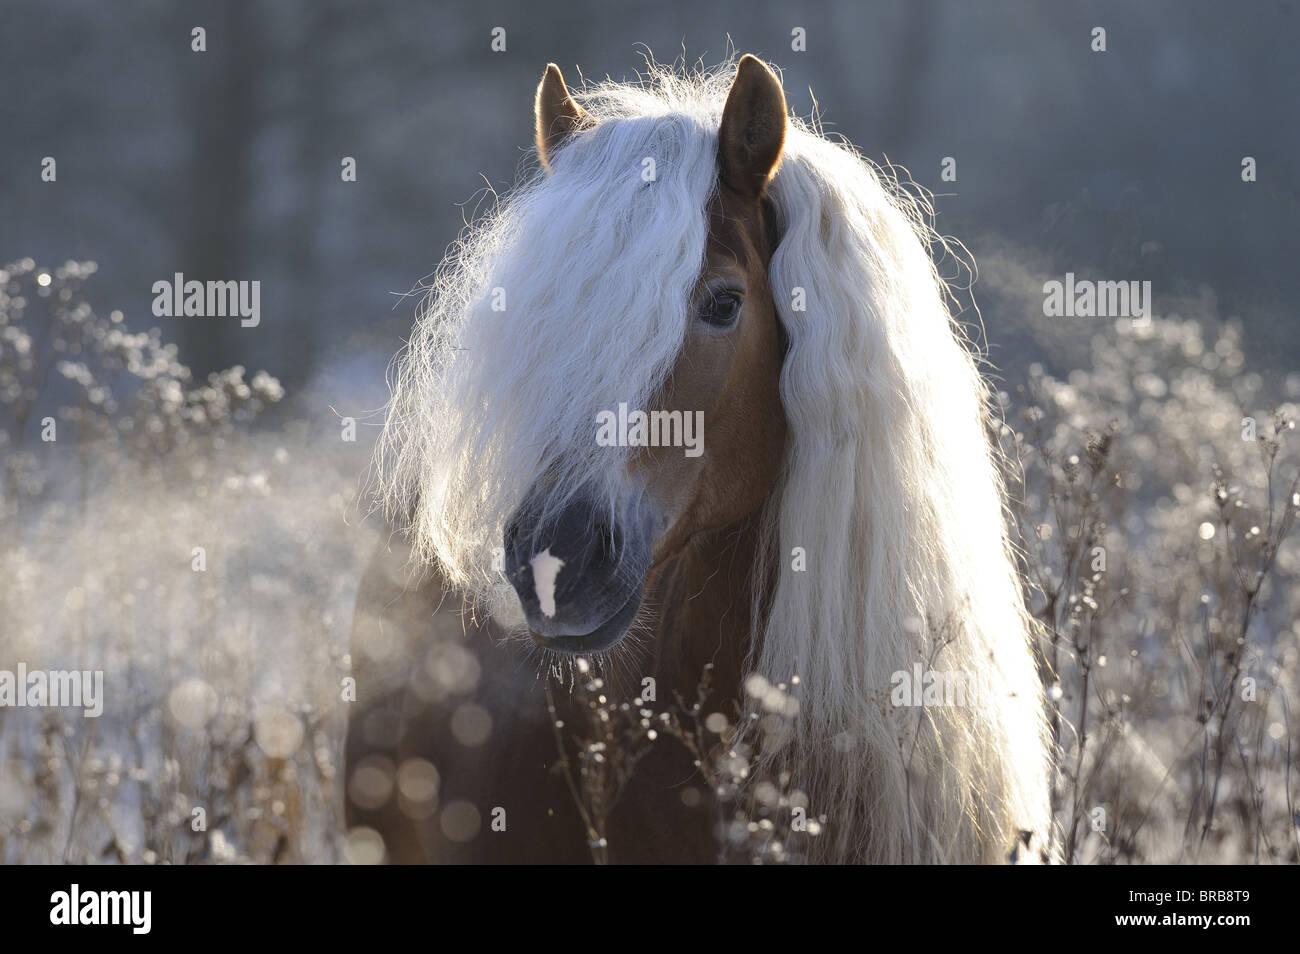 Haflinger Horse (Equus ferus caballus), portrait of a stallion with long mane. Stock Photo